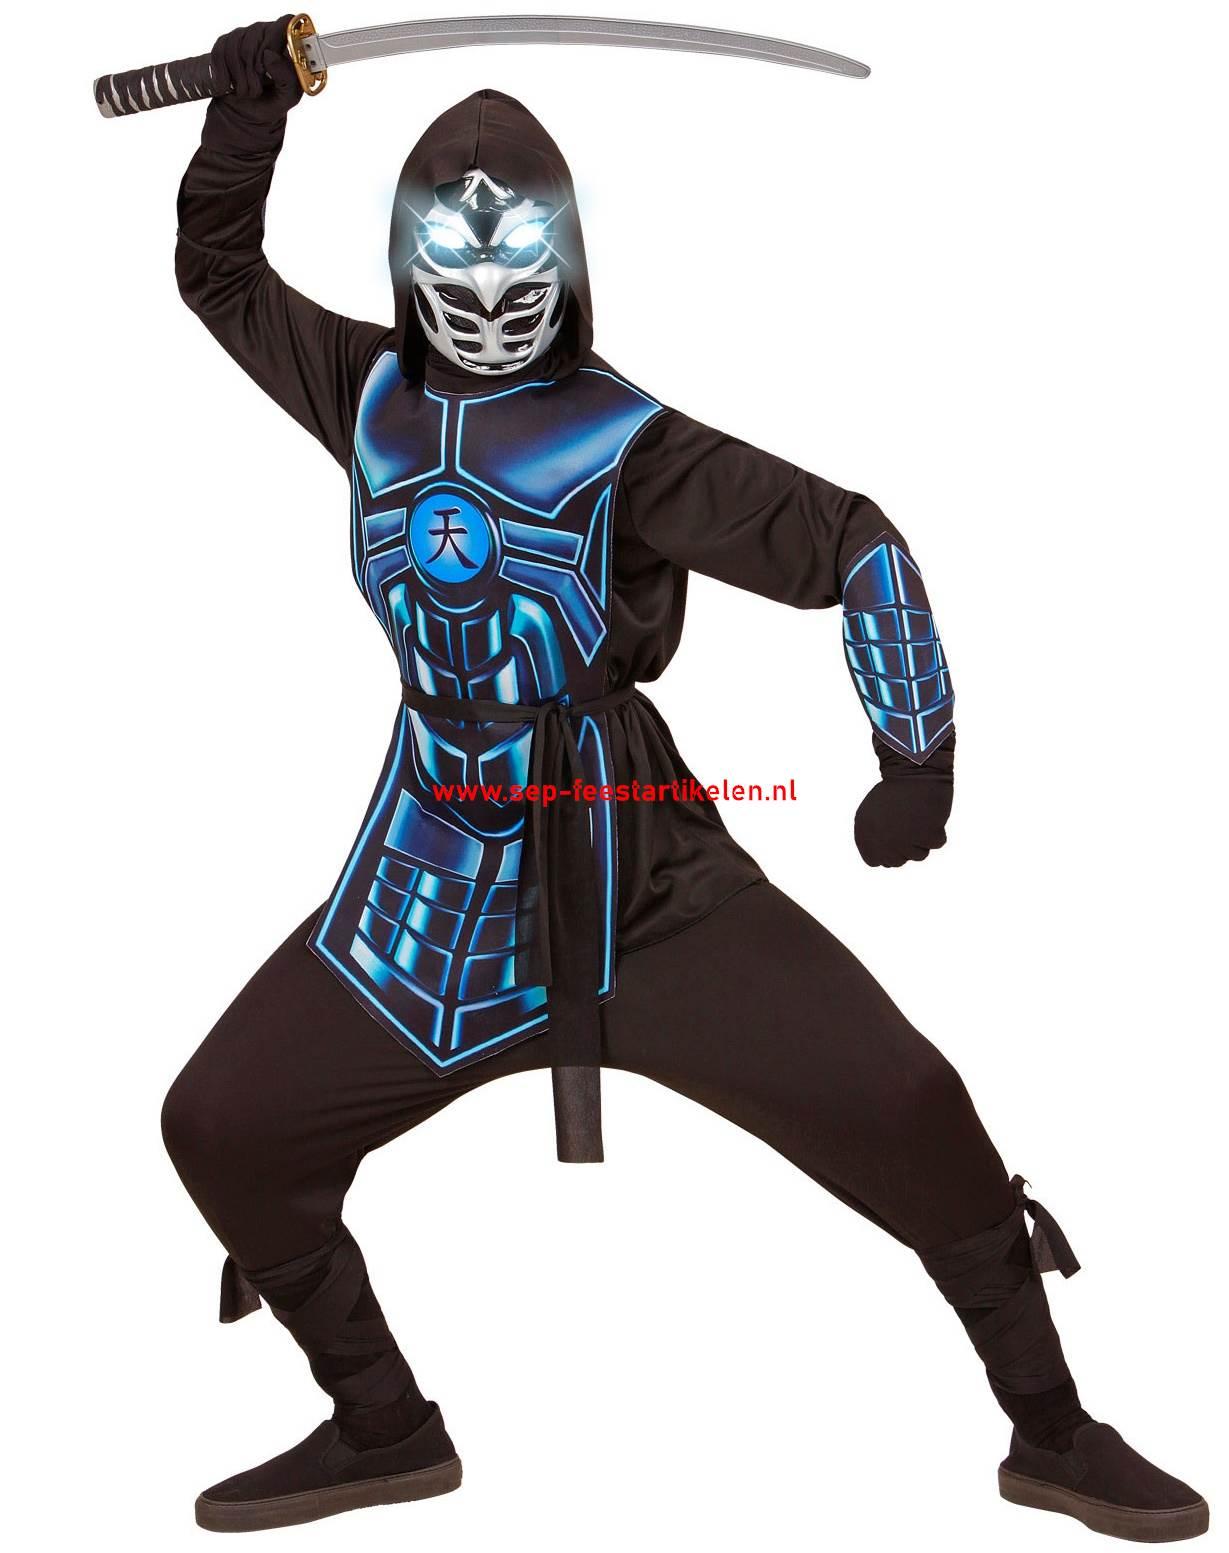 Carnavalskleding Dames Ninja.Cyber Ninja 5dlg Geen Broek Direct Leverbaar Sep Feestartikelen